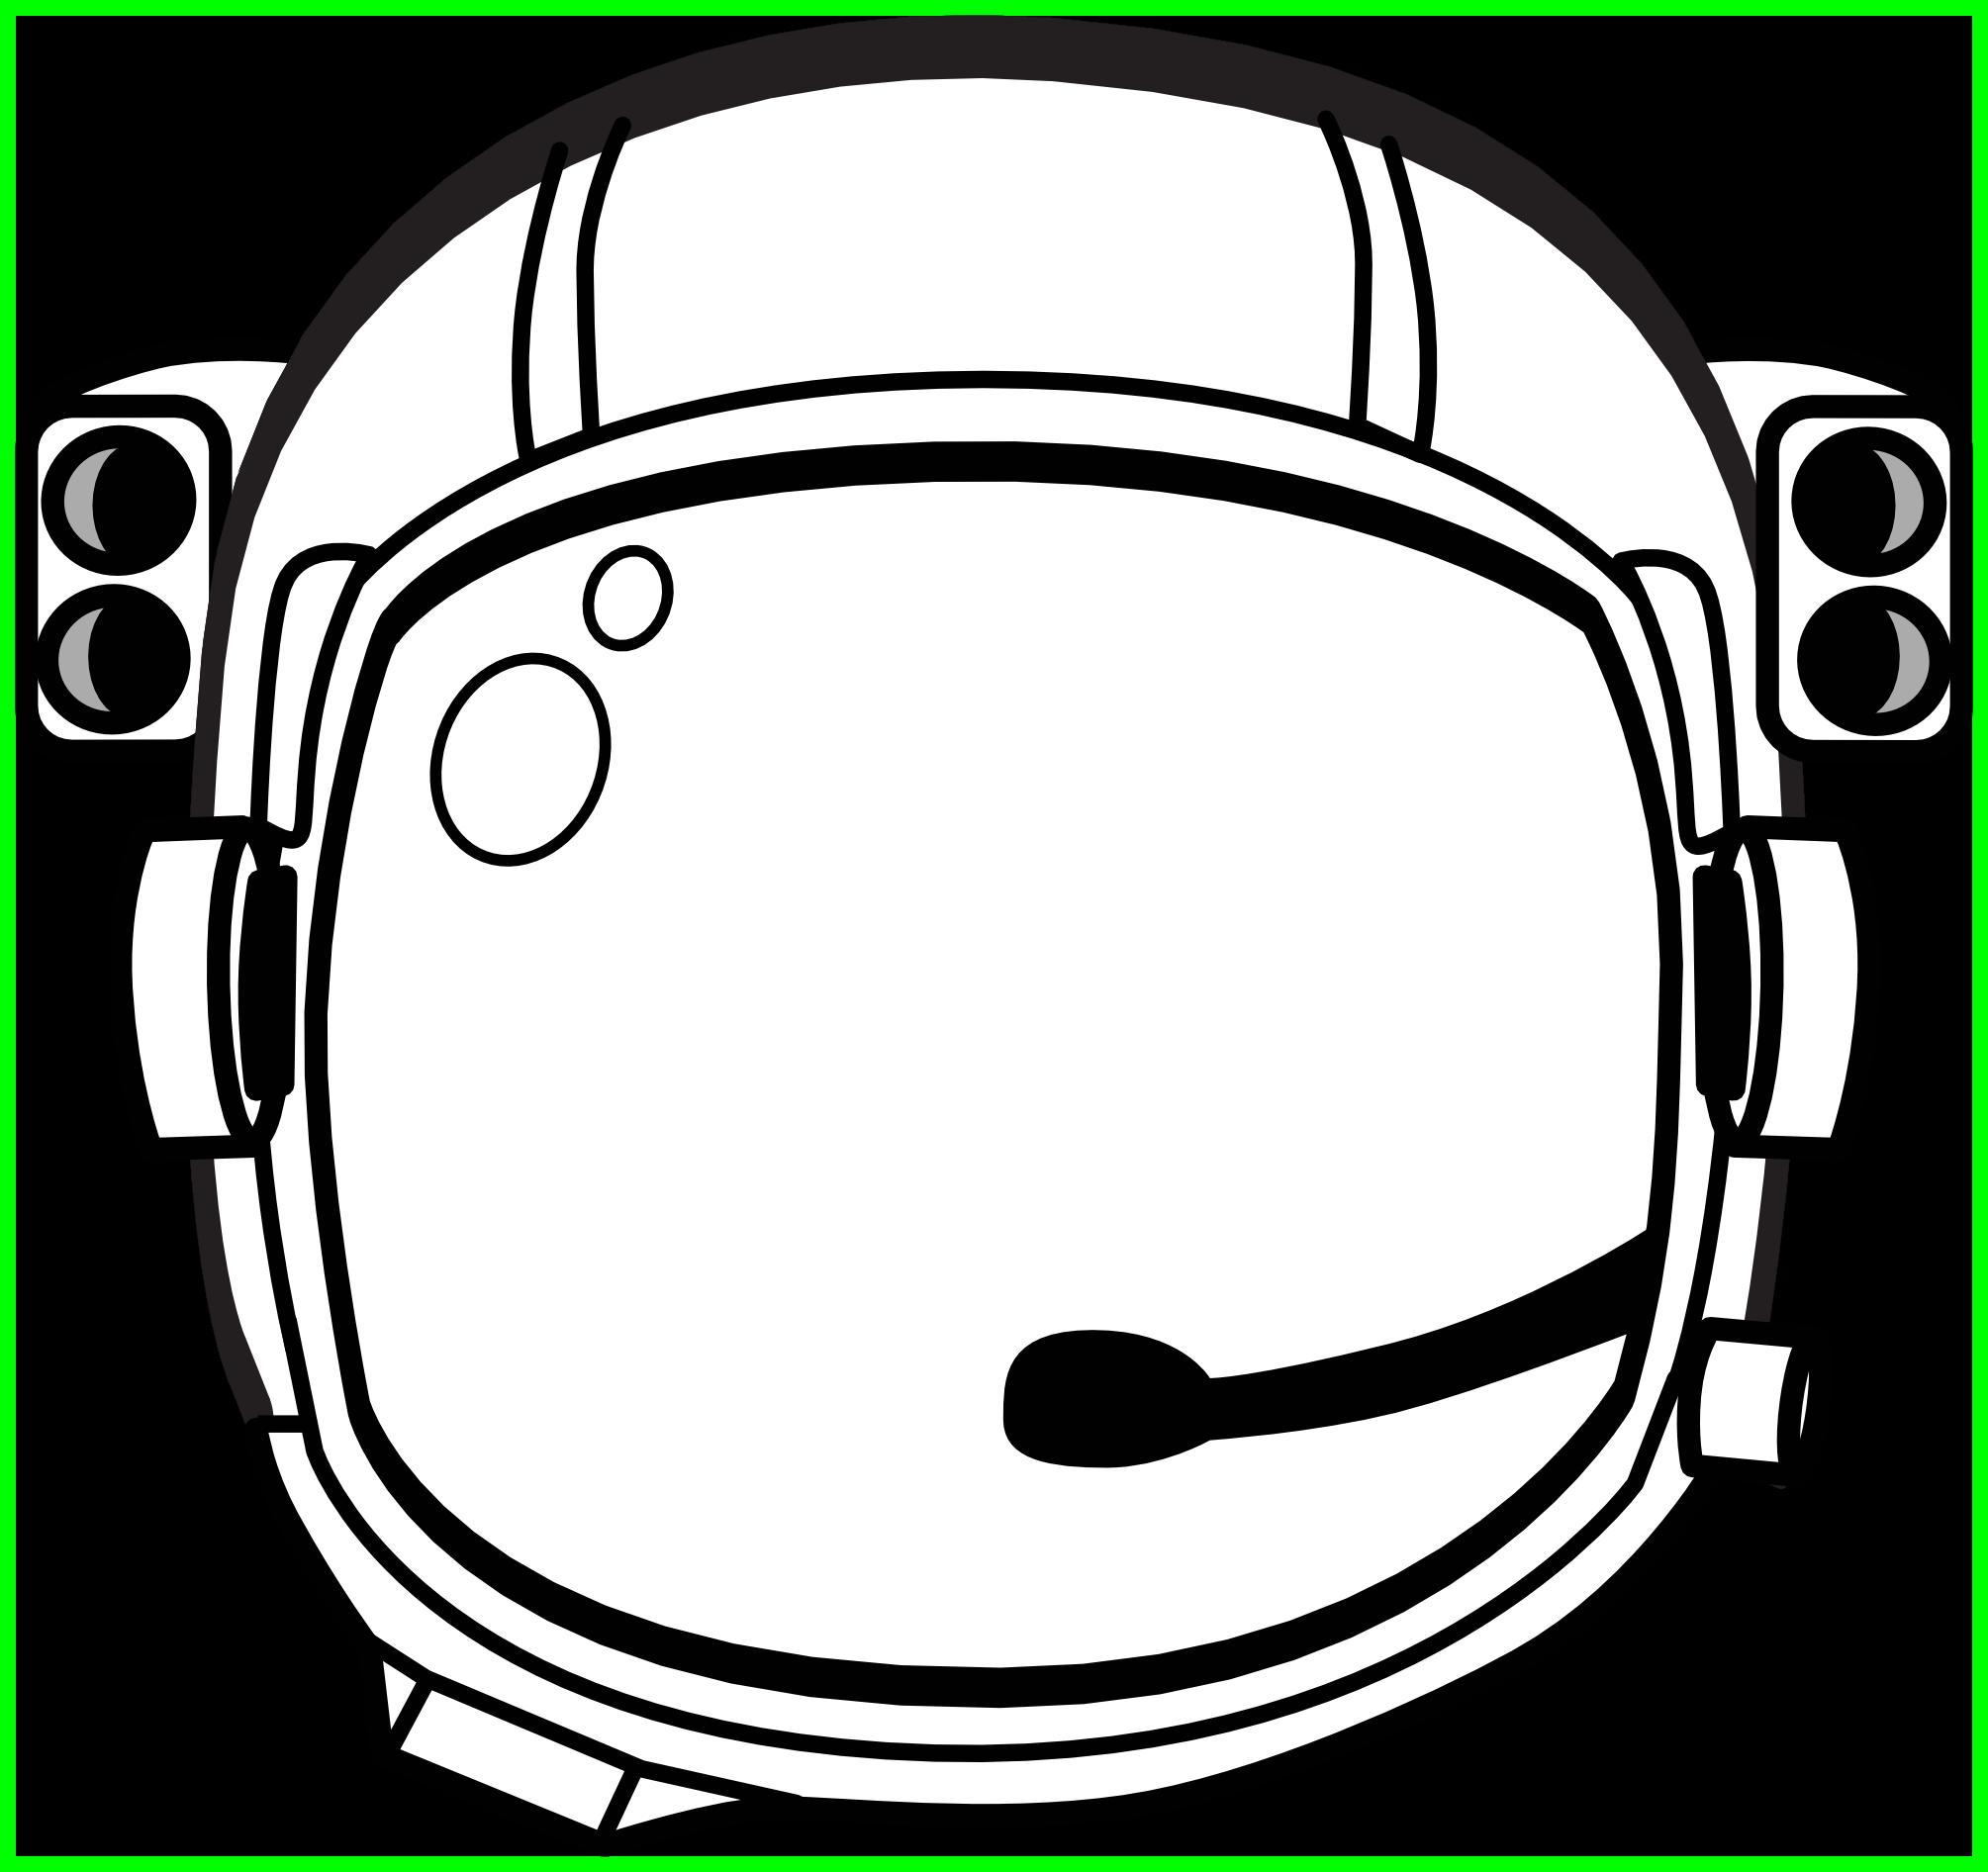 Appealing astronaut coloring pages. Lady clipart salwar suit